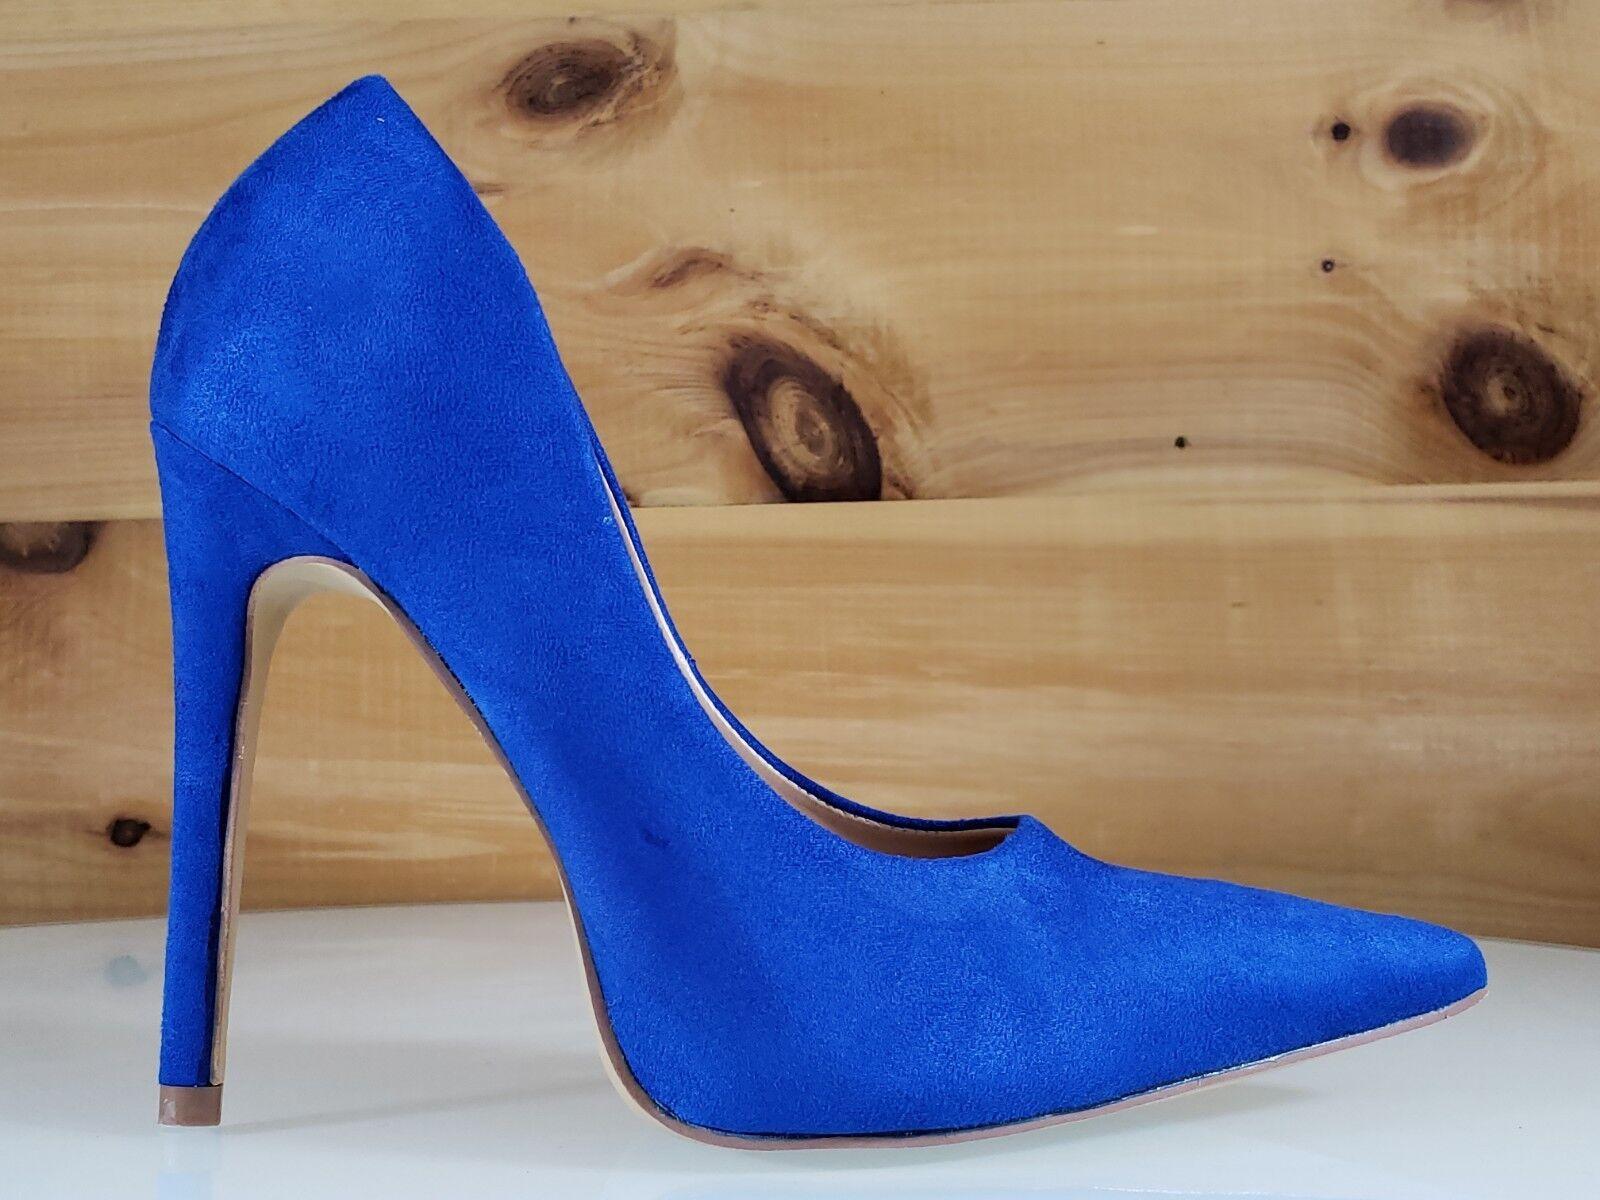 79ae53bebe20b Cherry Milly Vegan Suede Pointy Toe Pump shoes 4.5 High Heels bluee ...